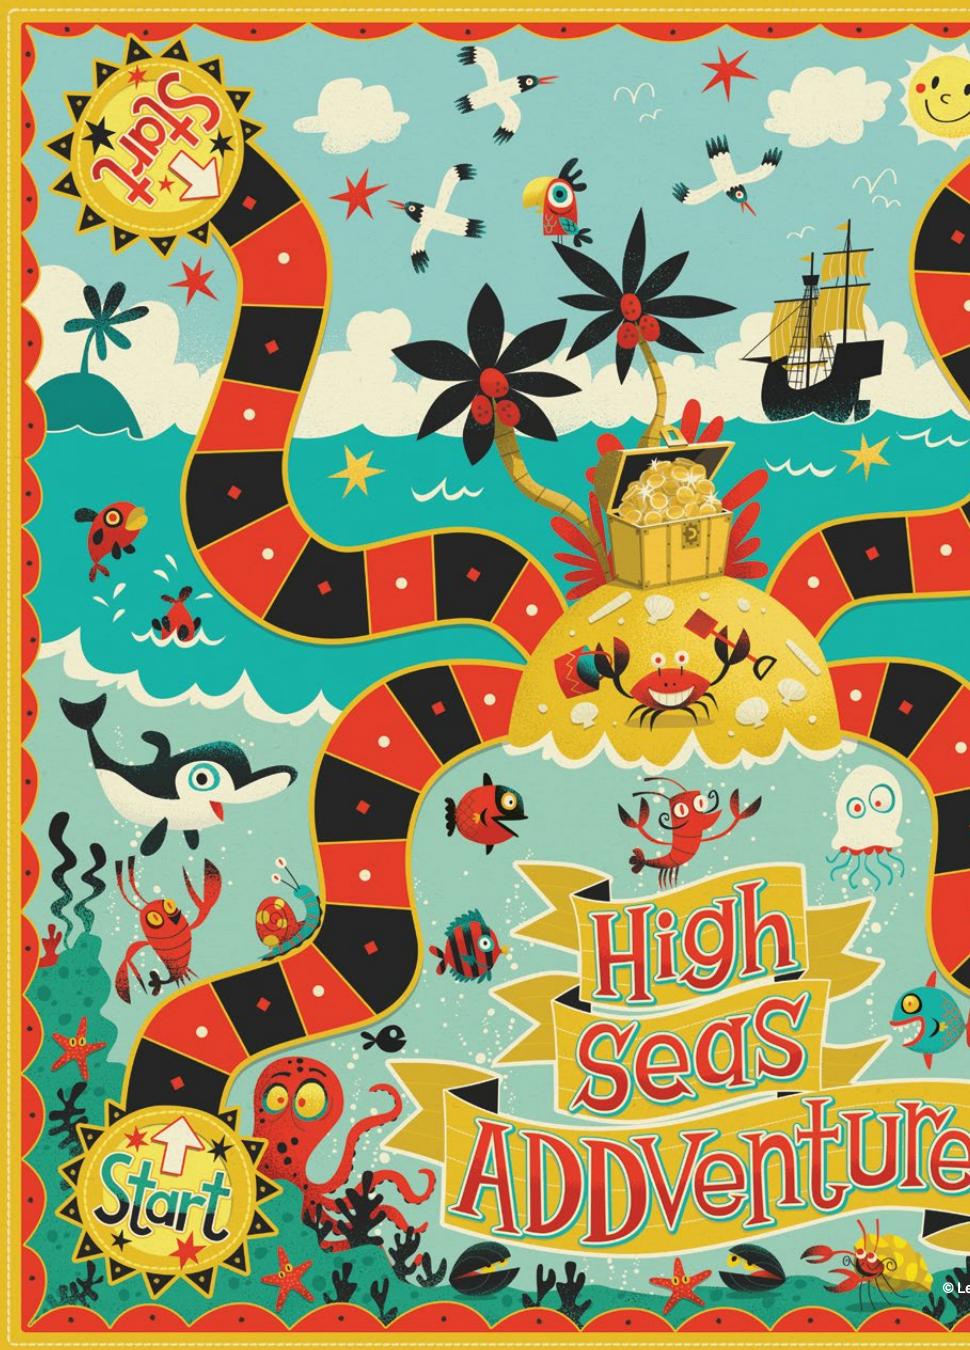 High Seas Addventure Game